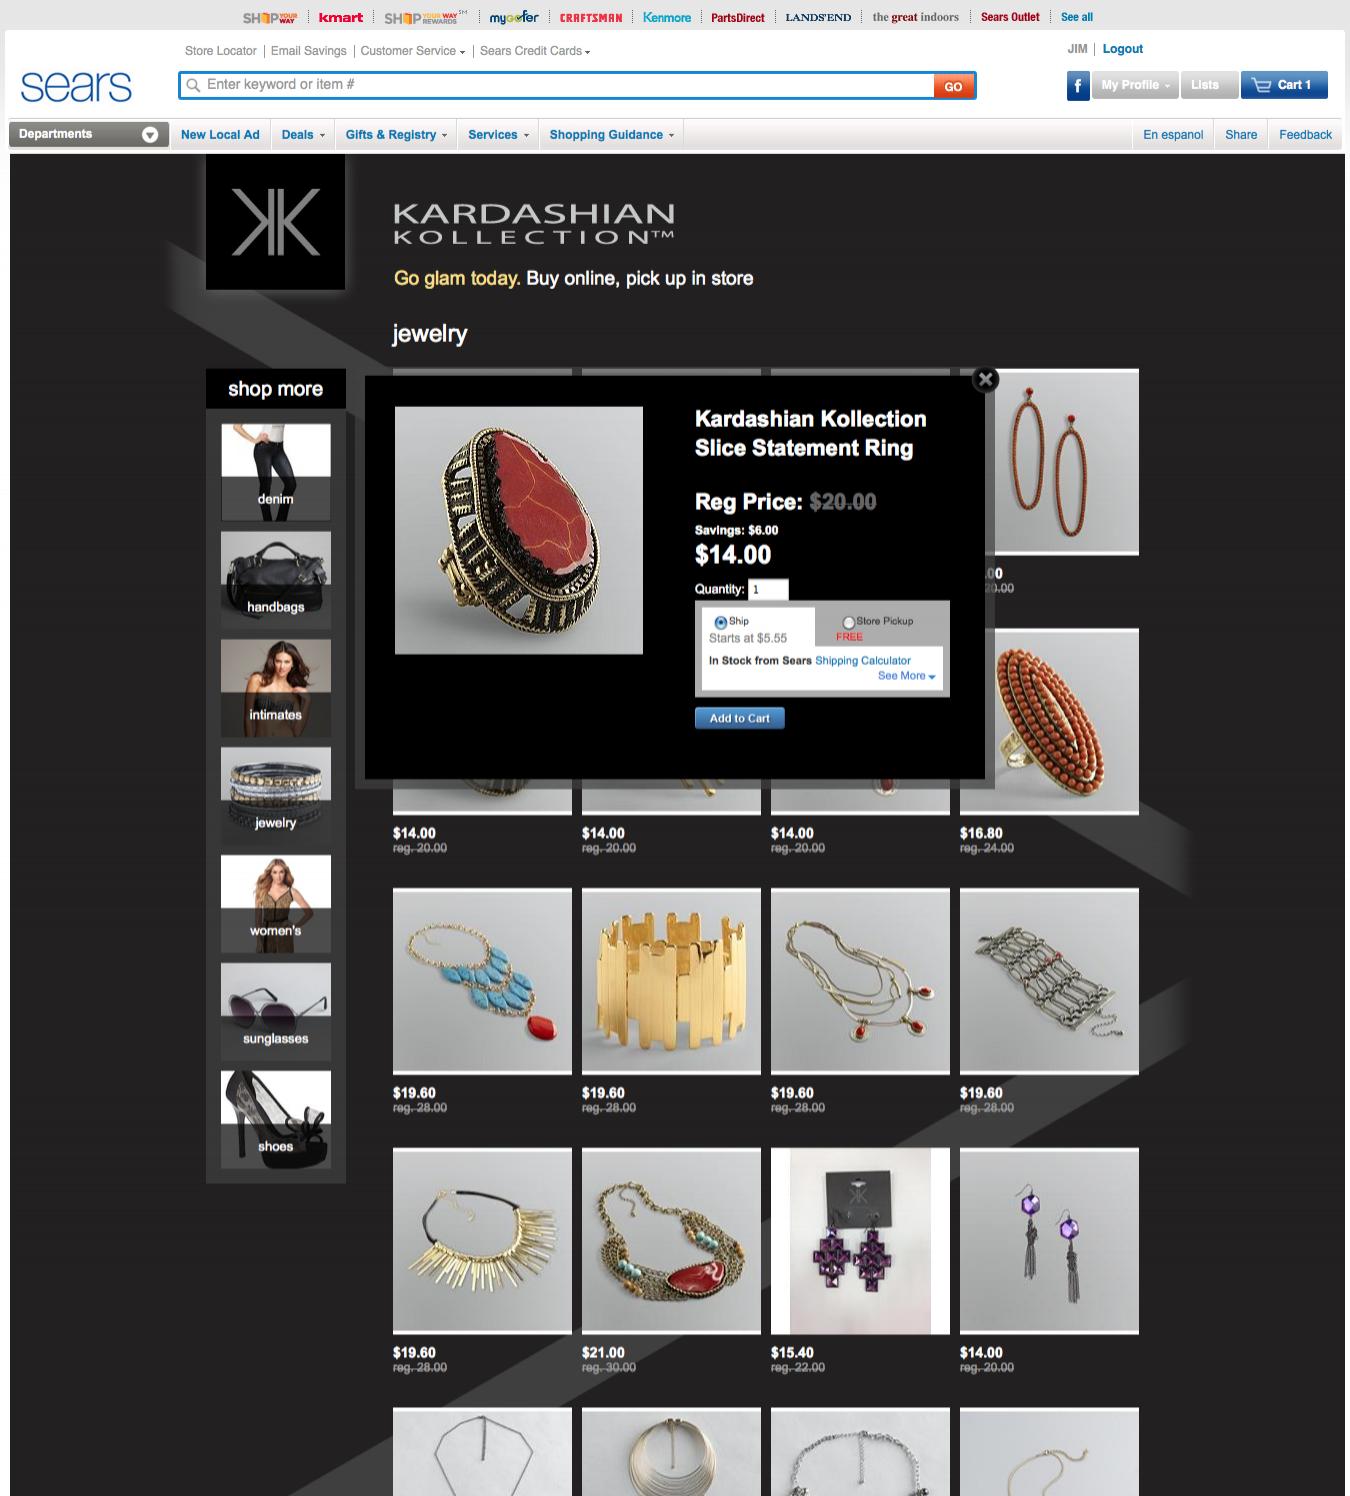 Kardashian Kollection Product Quickview